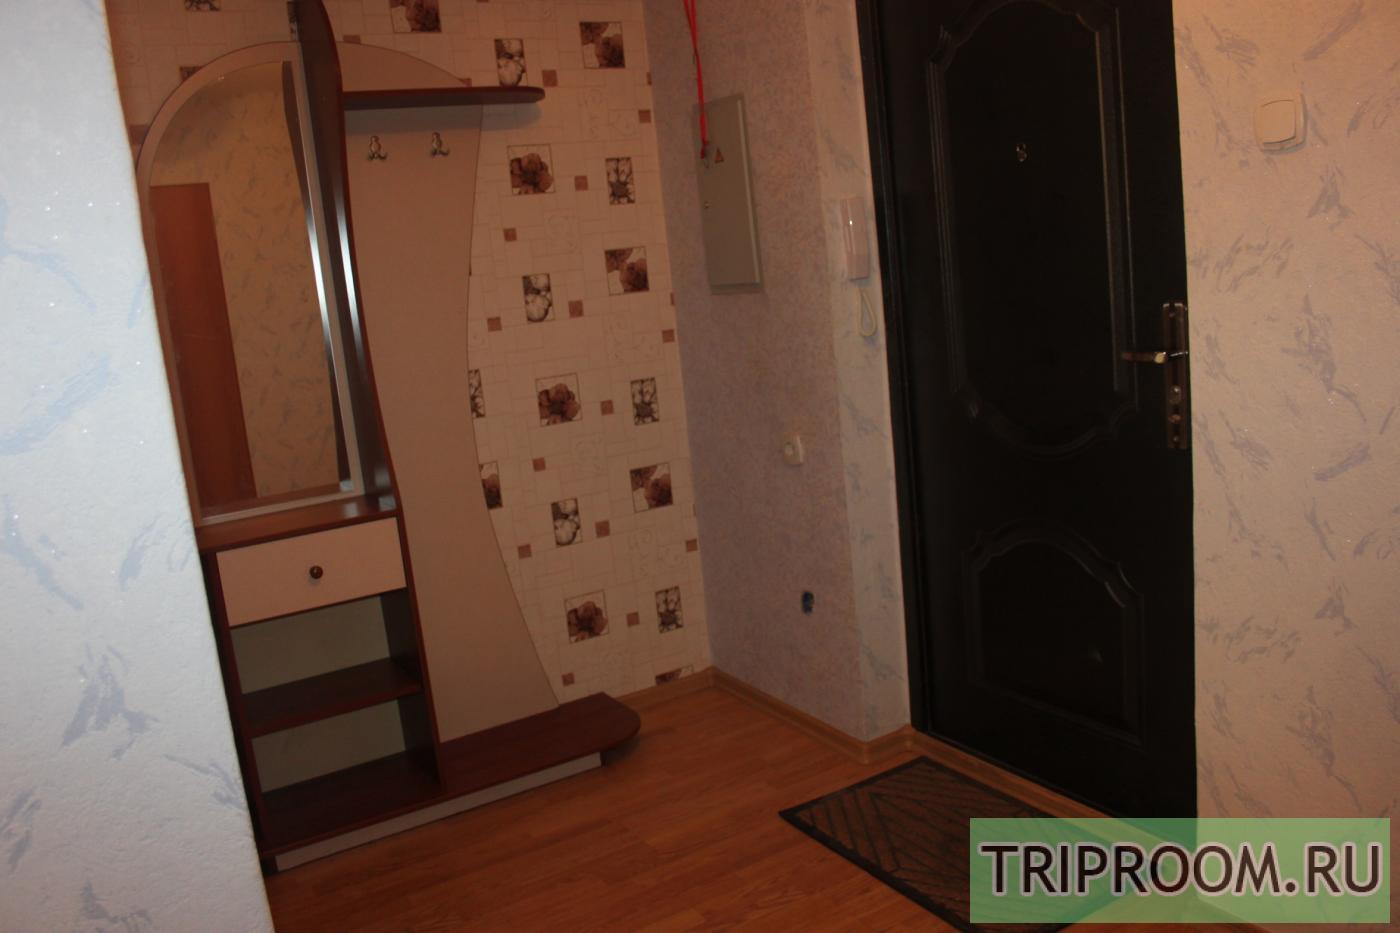 1-комнатная квартира посуточно (вариант № 6675), ул. Победы бульвар, фото № 2